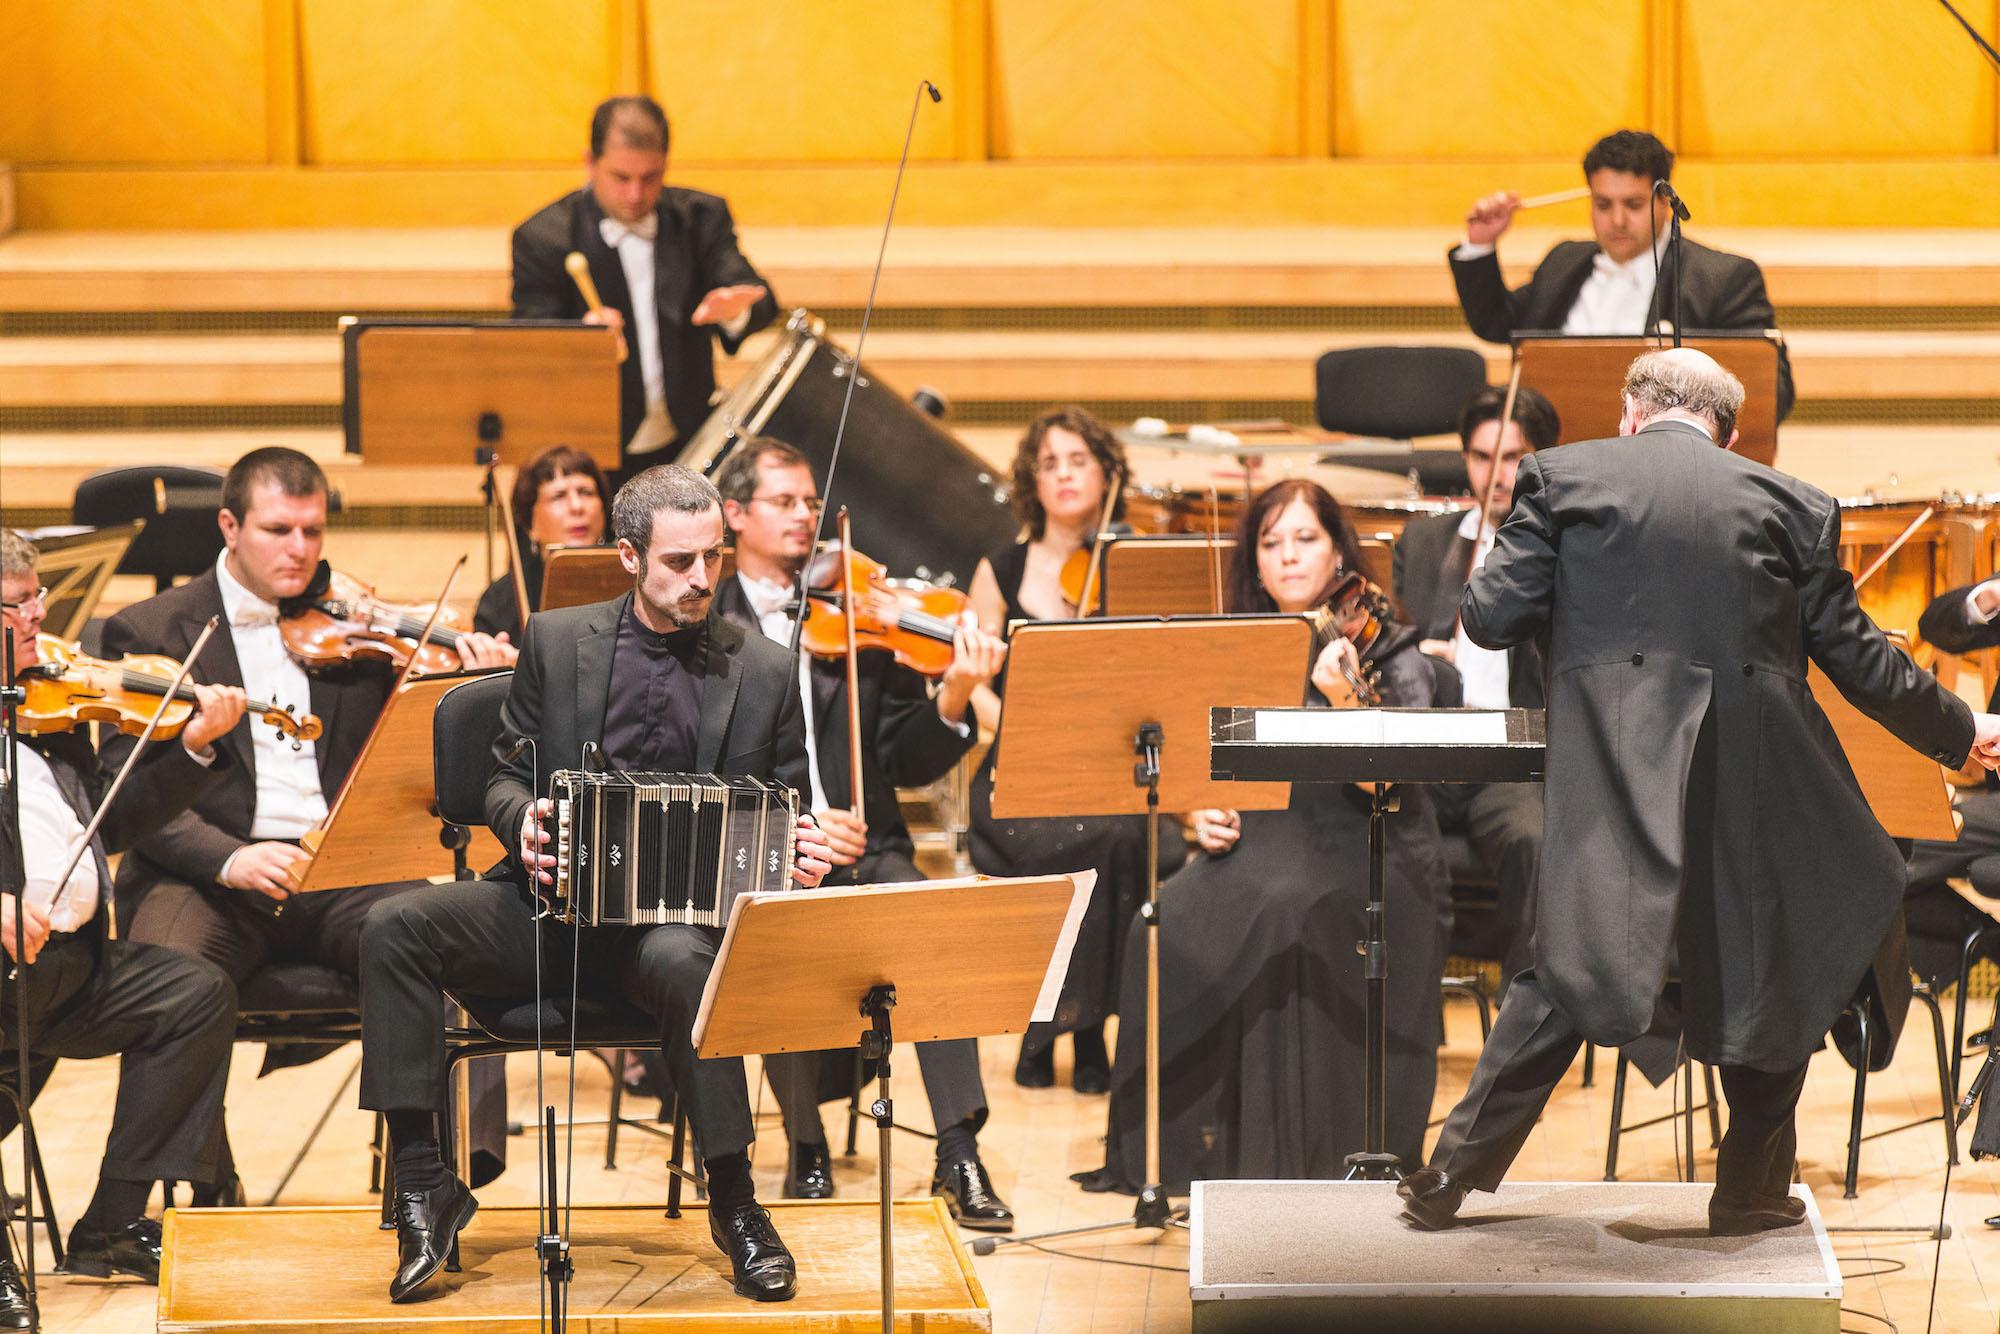 Omar-Massa-Playing-Bandoneon-Orchestra.jpeg